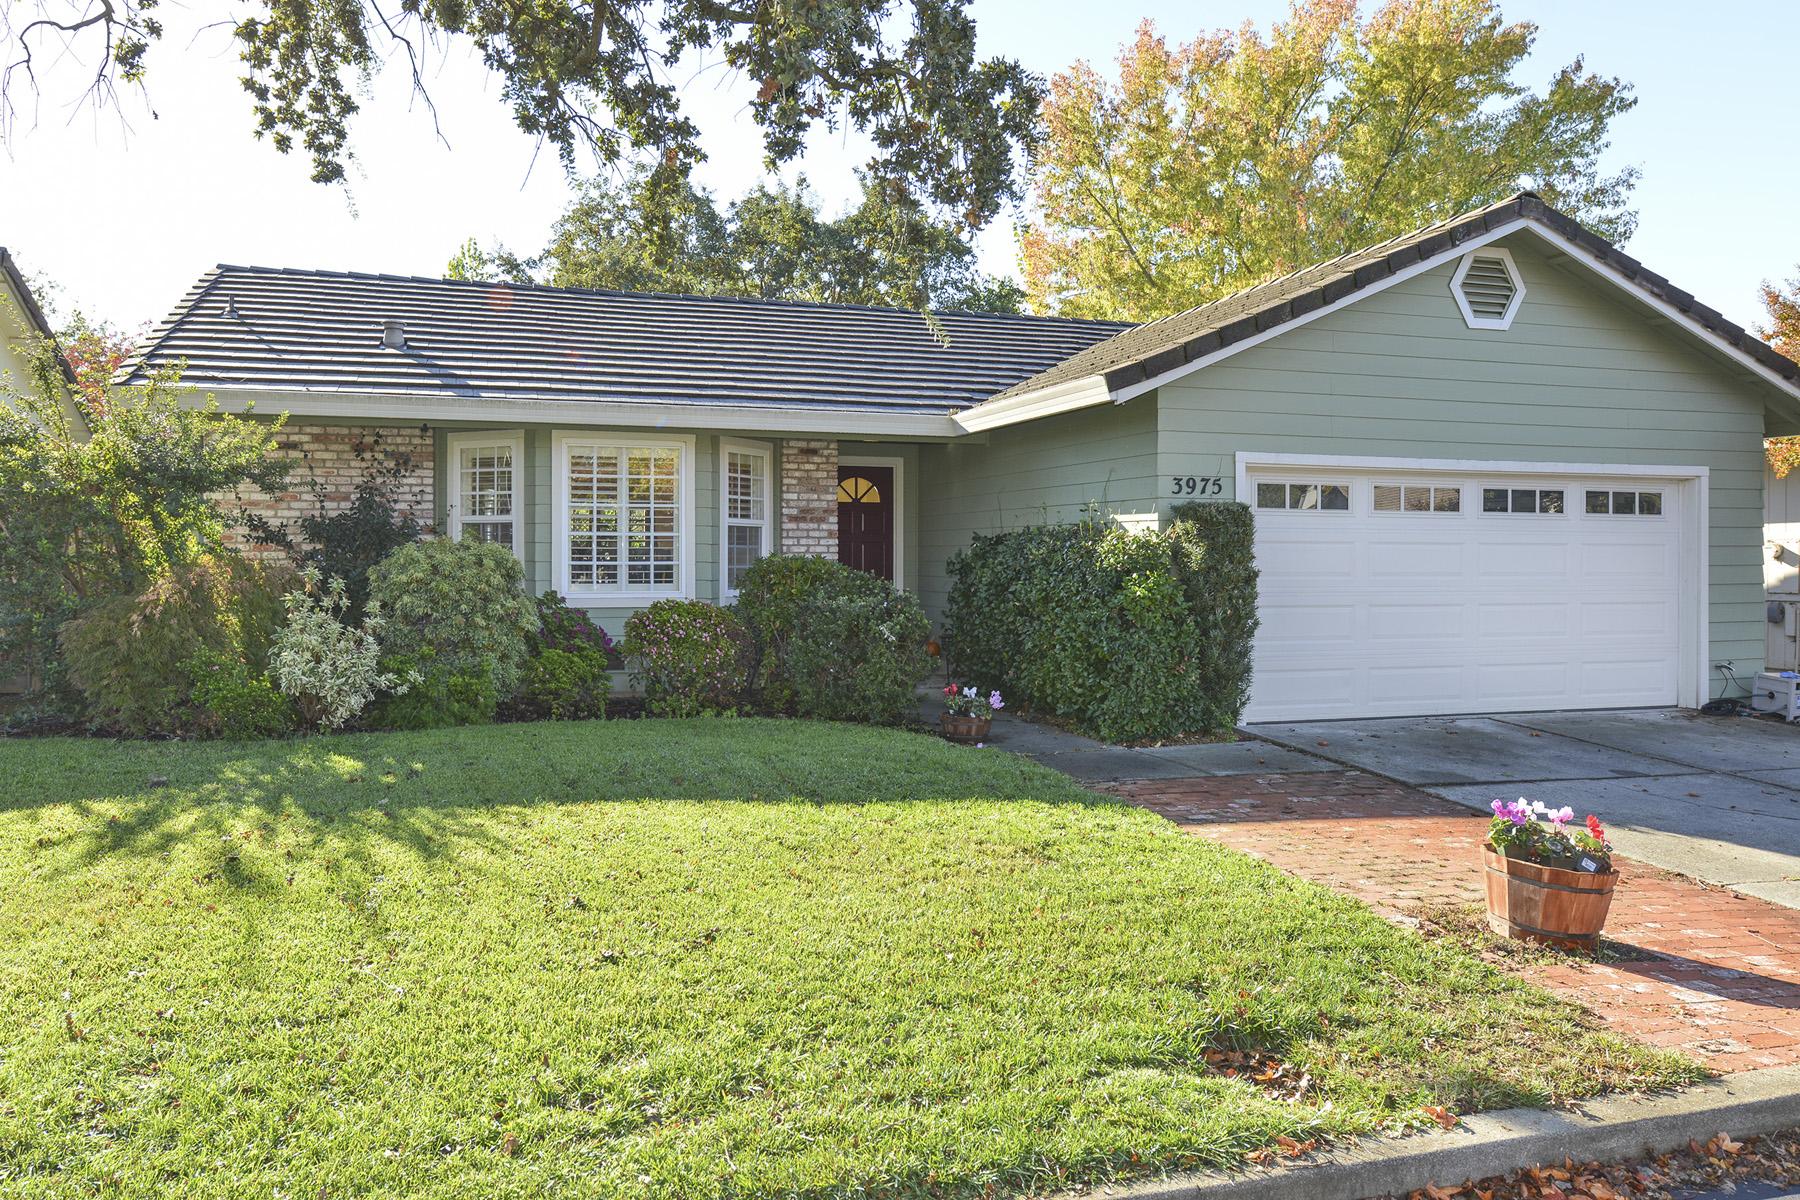 Property For Sale at 3975 Hampton Way, Napa, CA 94558